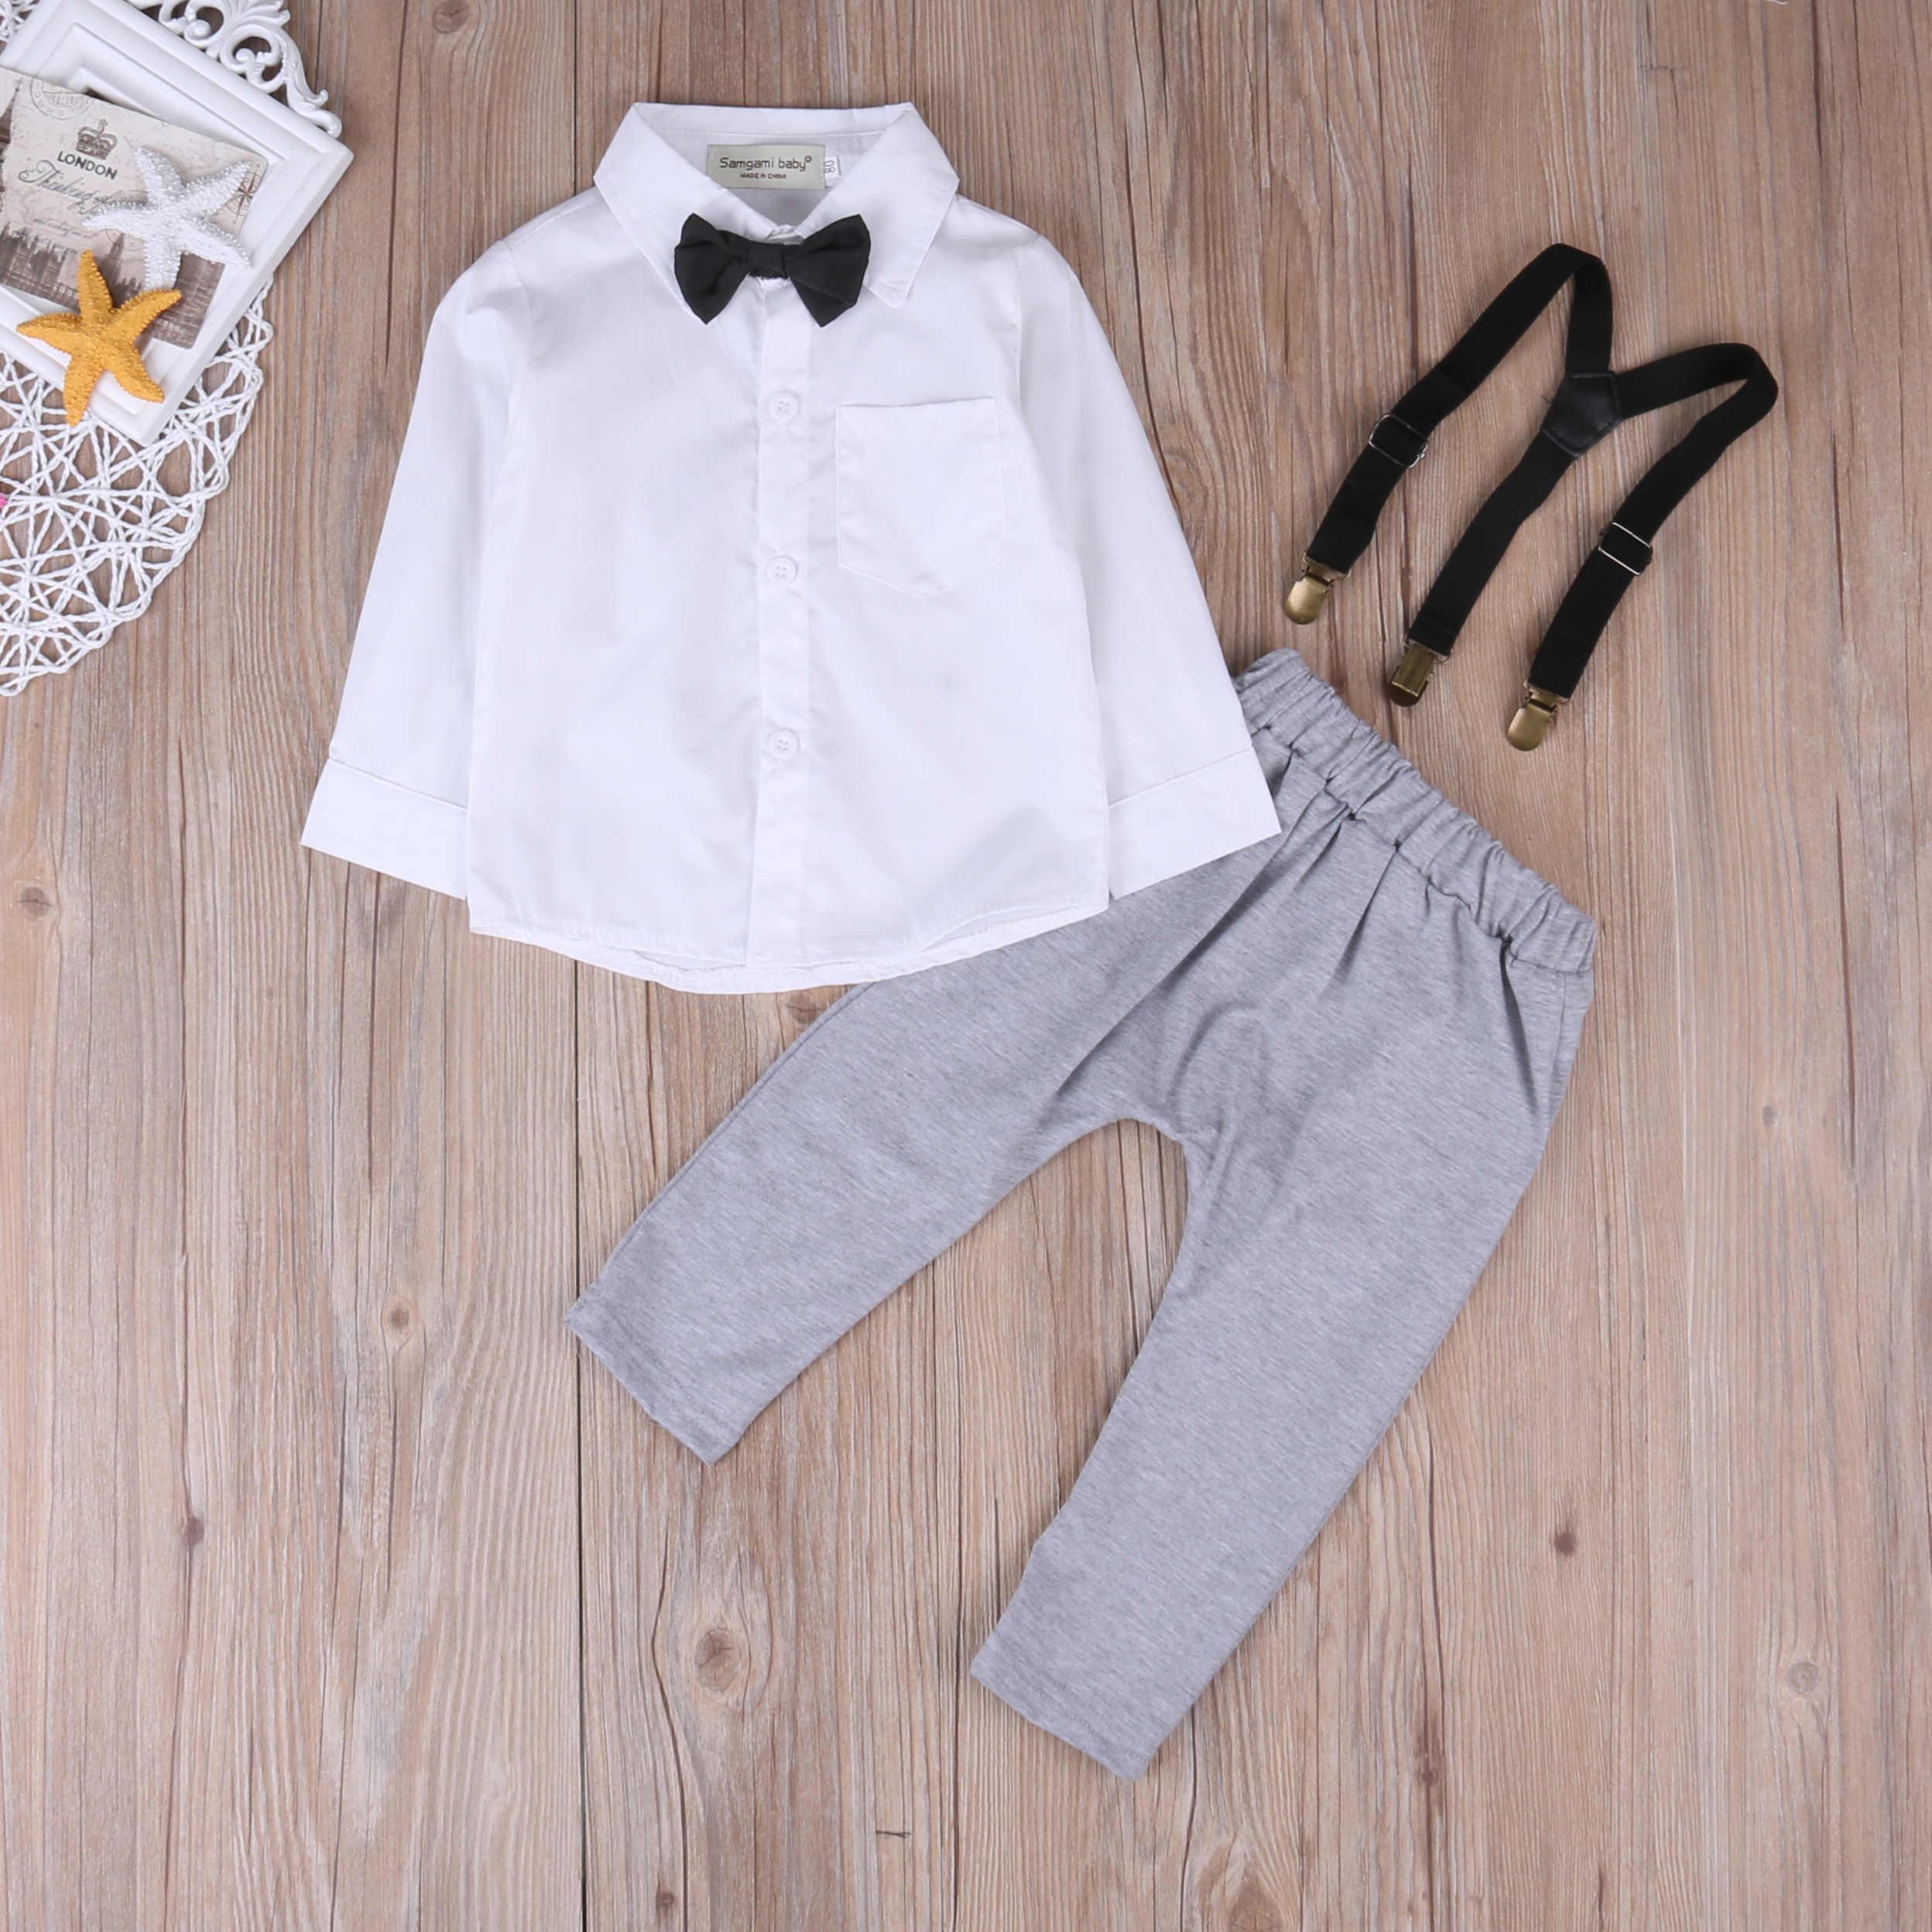 73bdb0c3e ... 2Pcs Infant Baby Boys Little Gentleman Costume Clothes White Shirt  Tops+Overalls Suspender Trouser Outfit ...